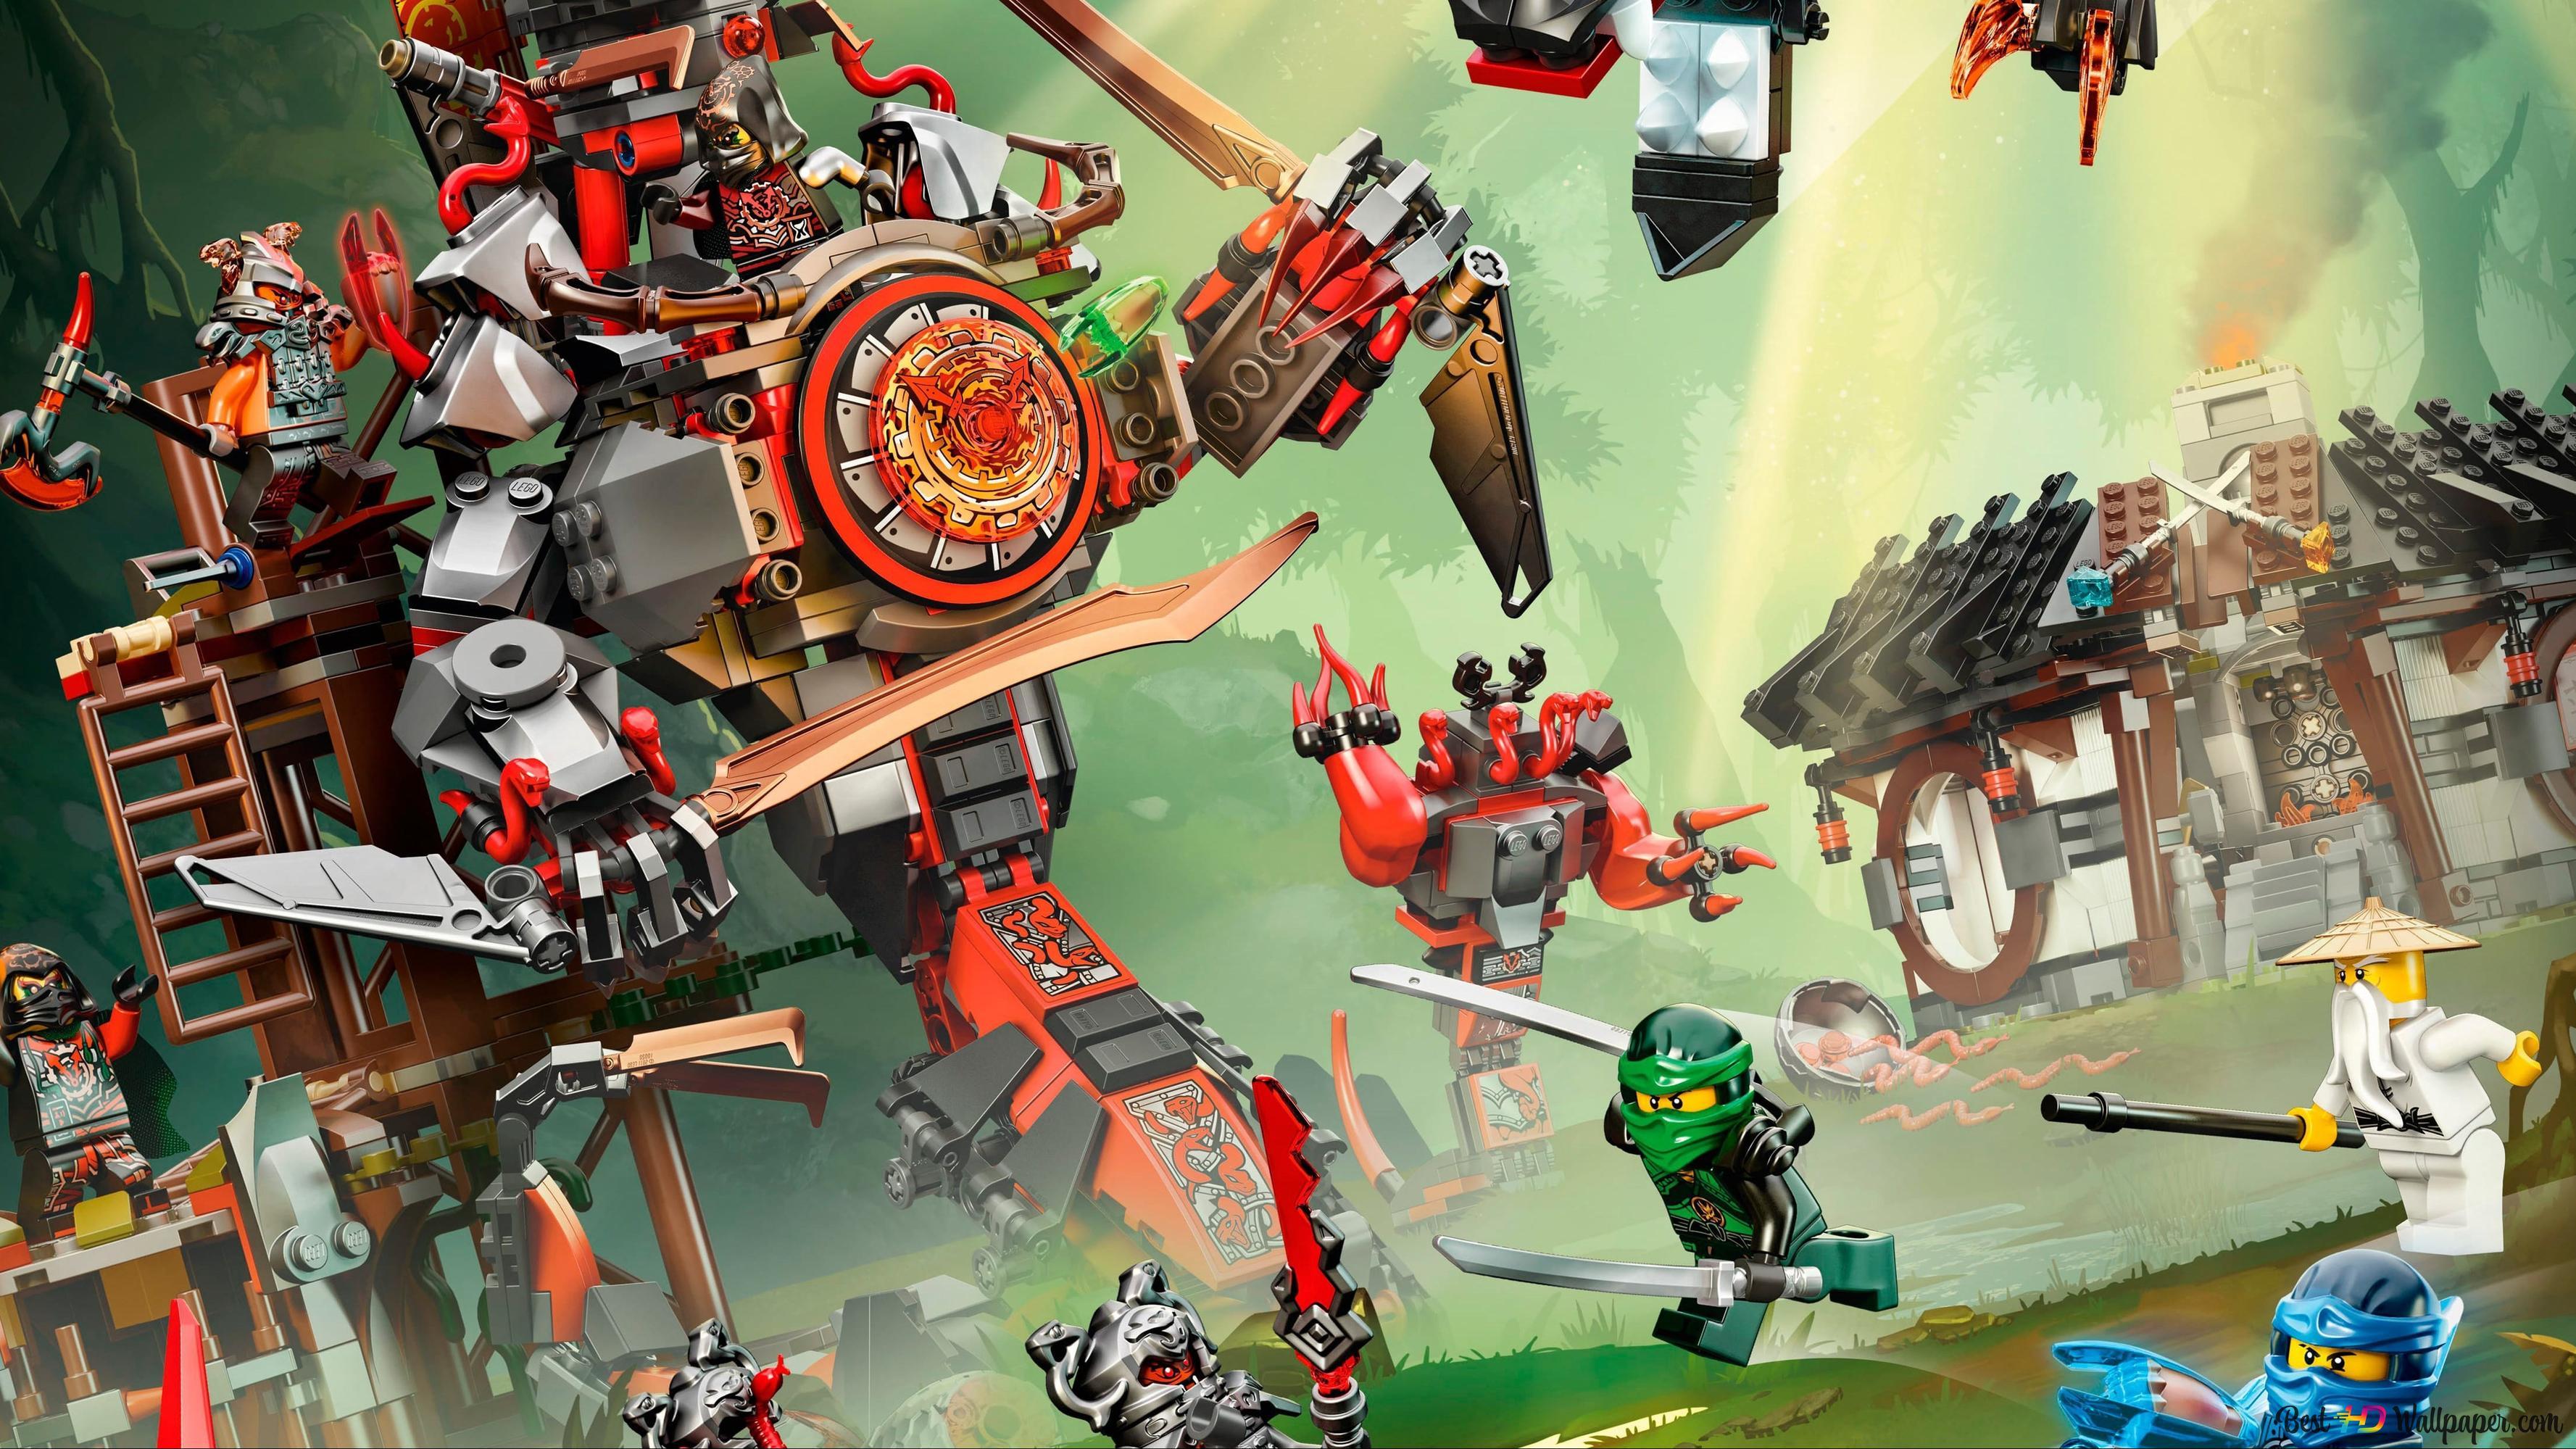 Populair De LEGO Ninjago - Battle HD wallpaper downloaden AU21